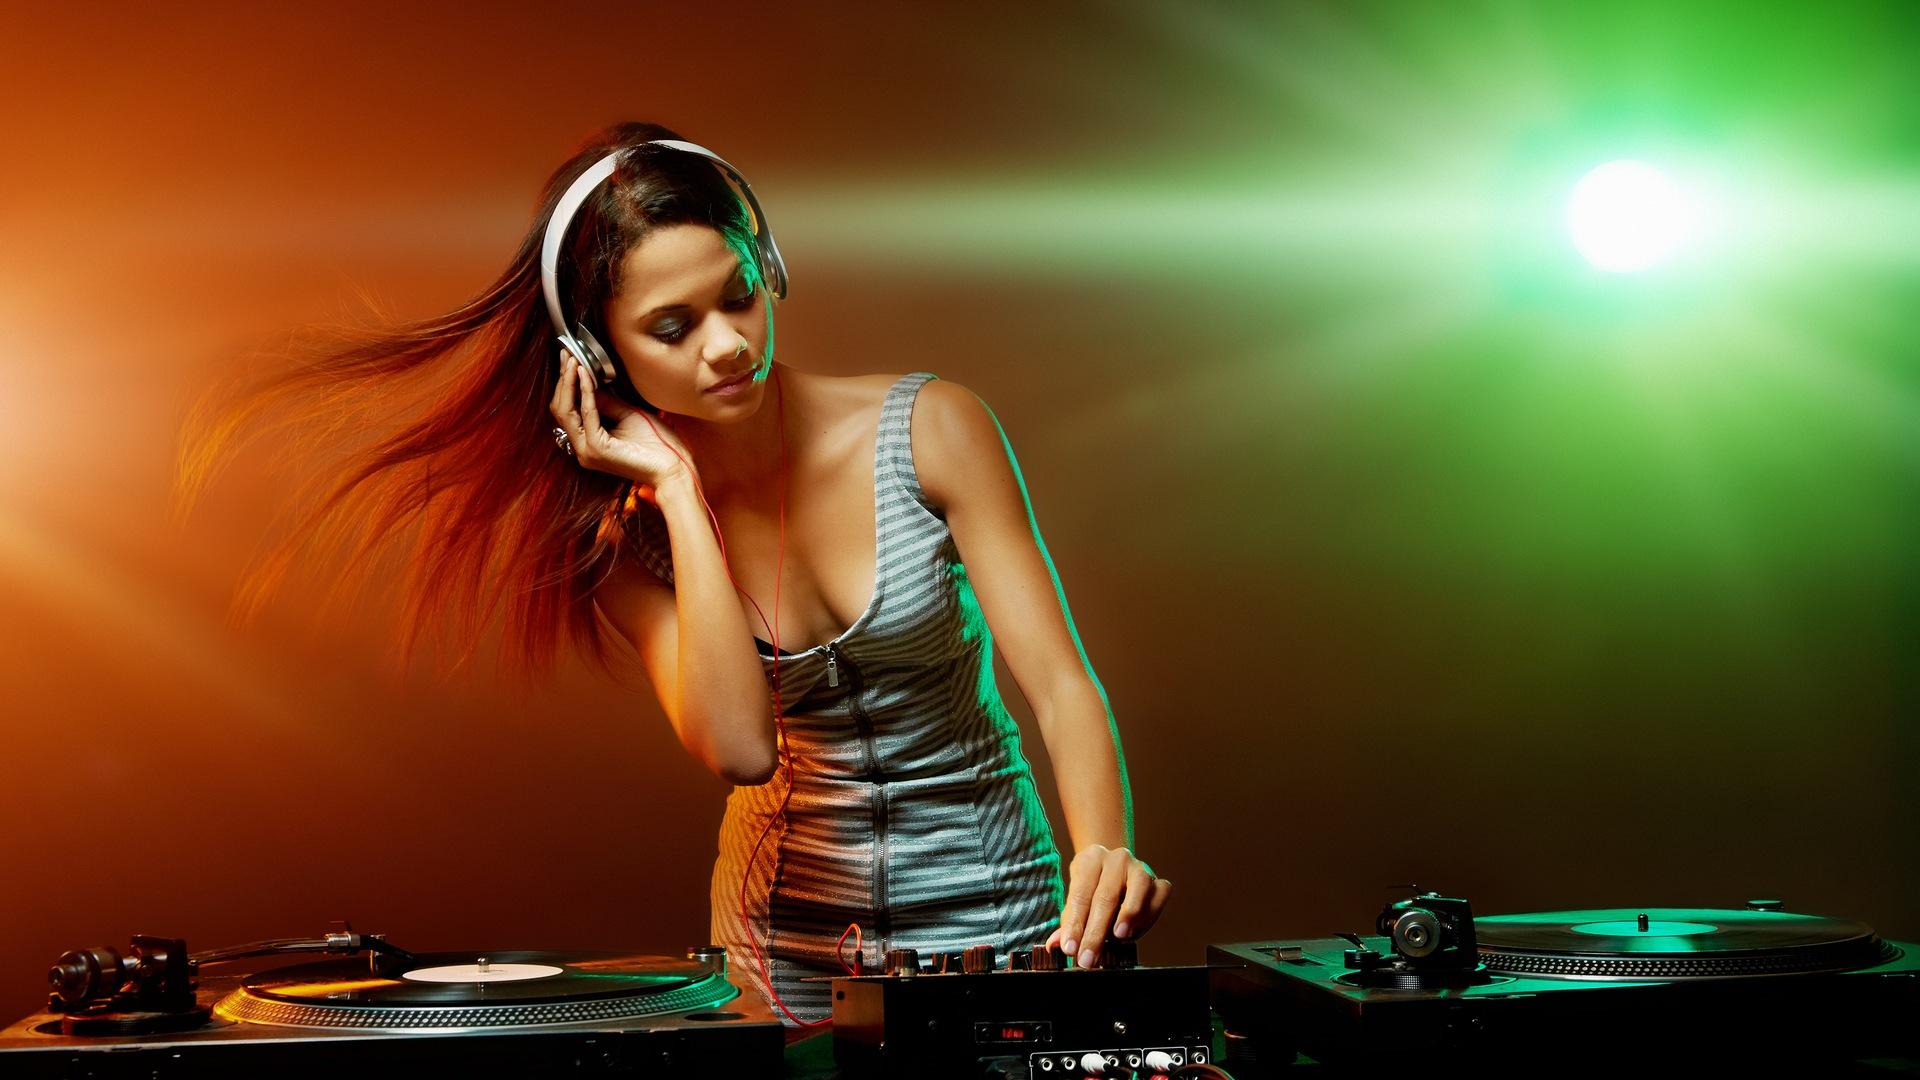 Dj Background Download Free Beautiful Full Hd: 1920x1080 Party Dj Girl Laptop Full HD 1080P HD 4k